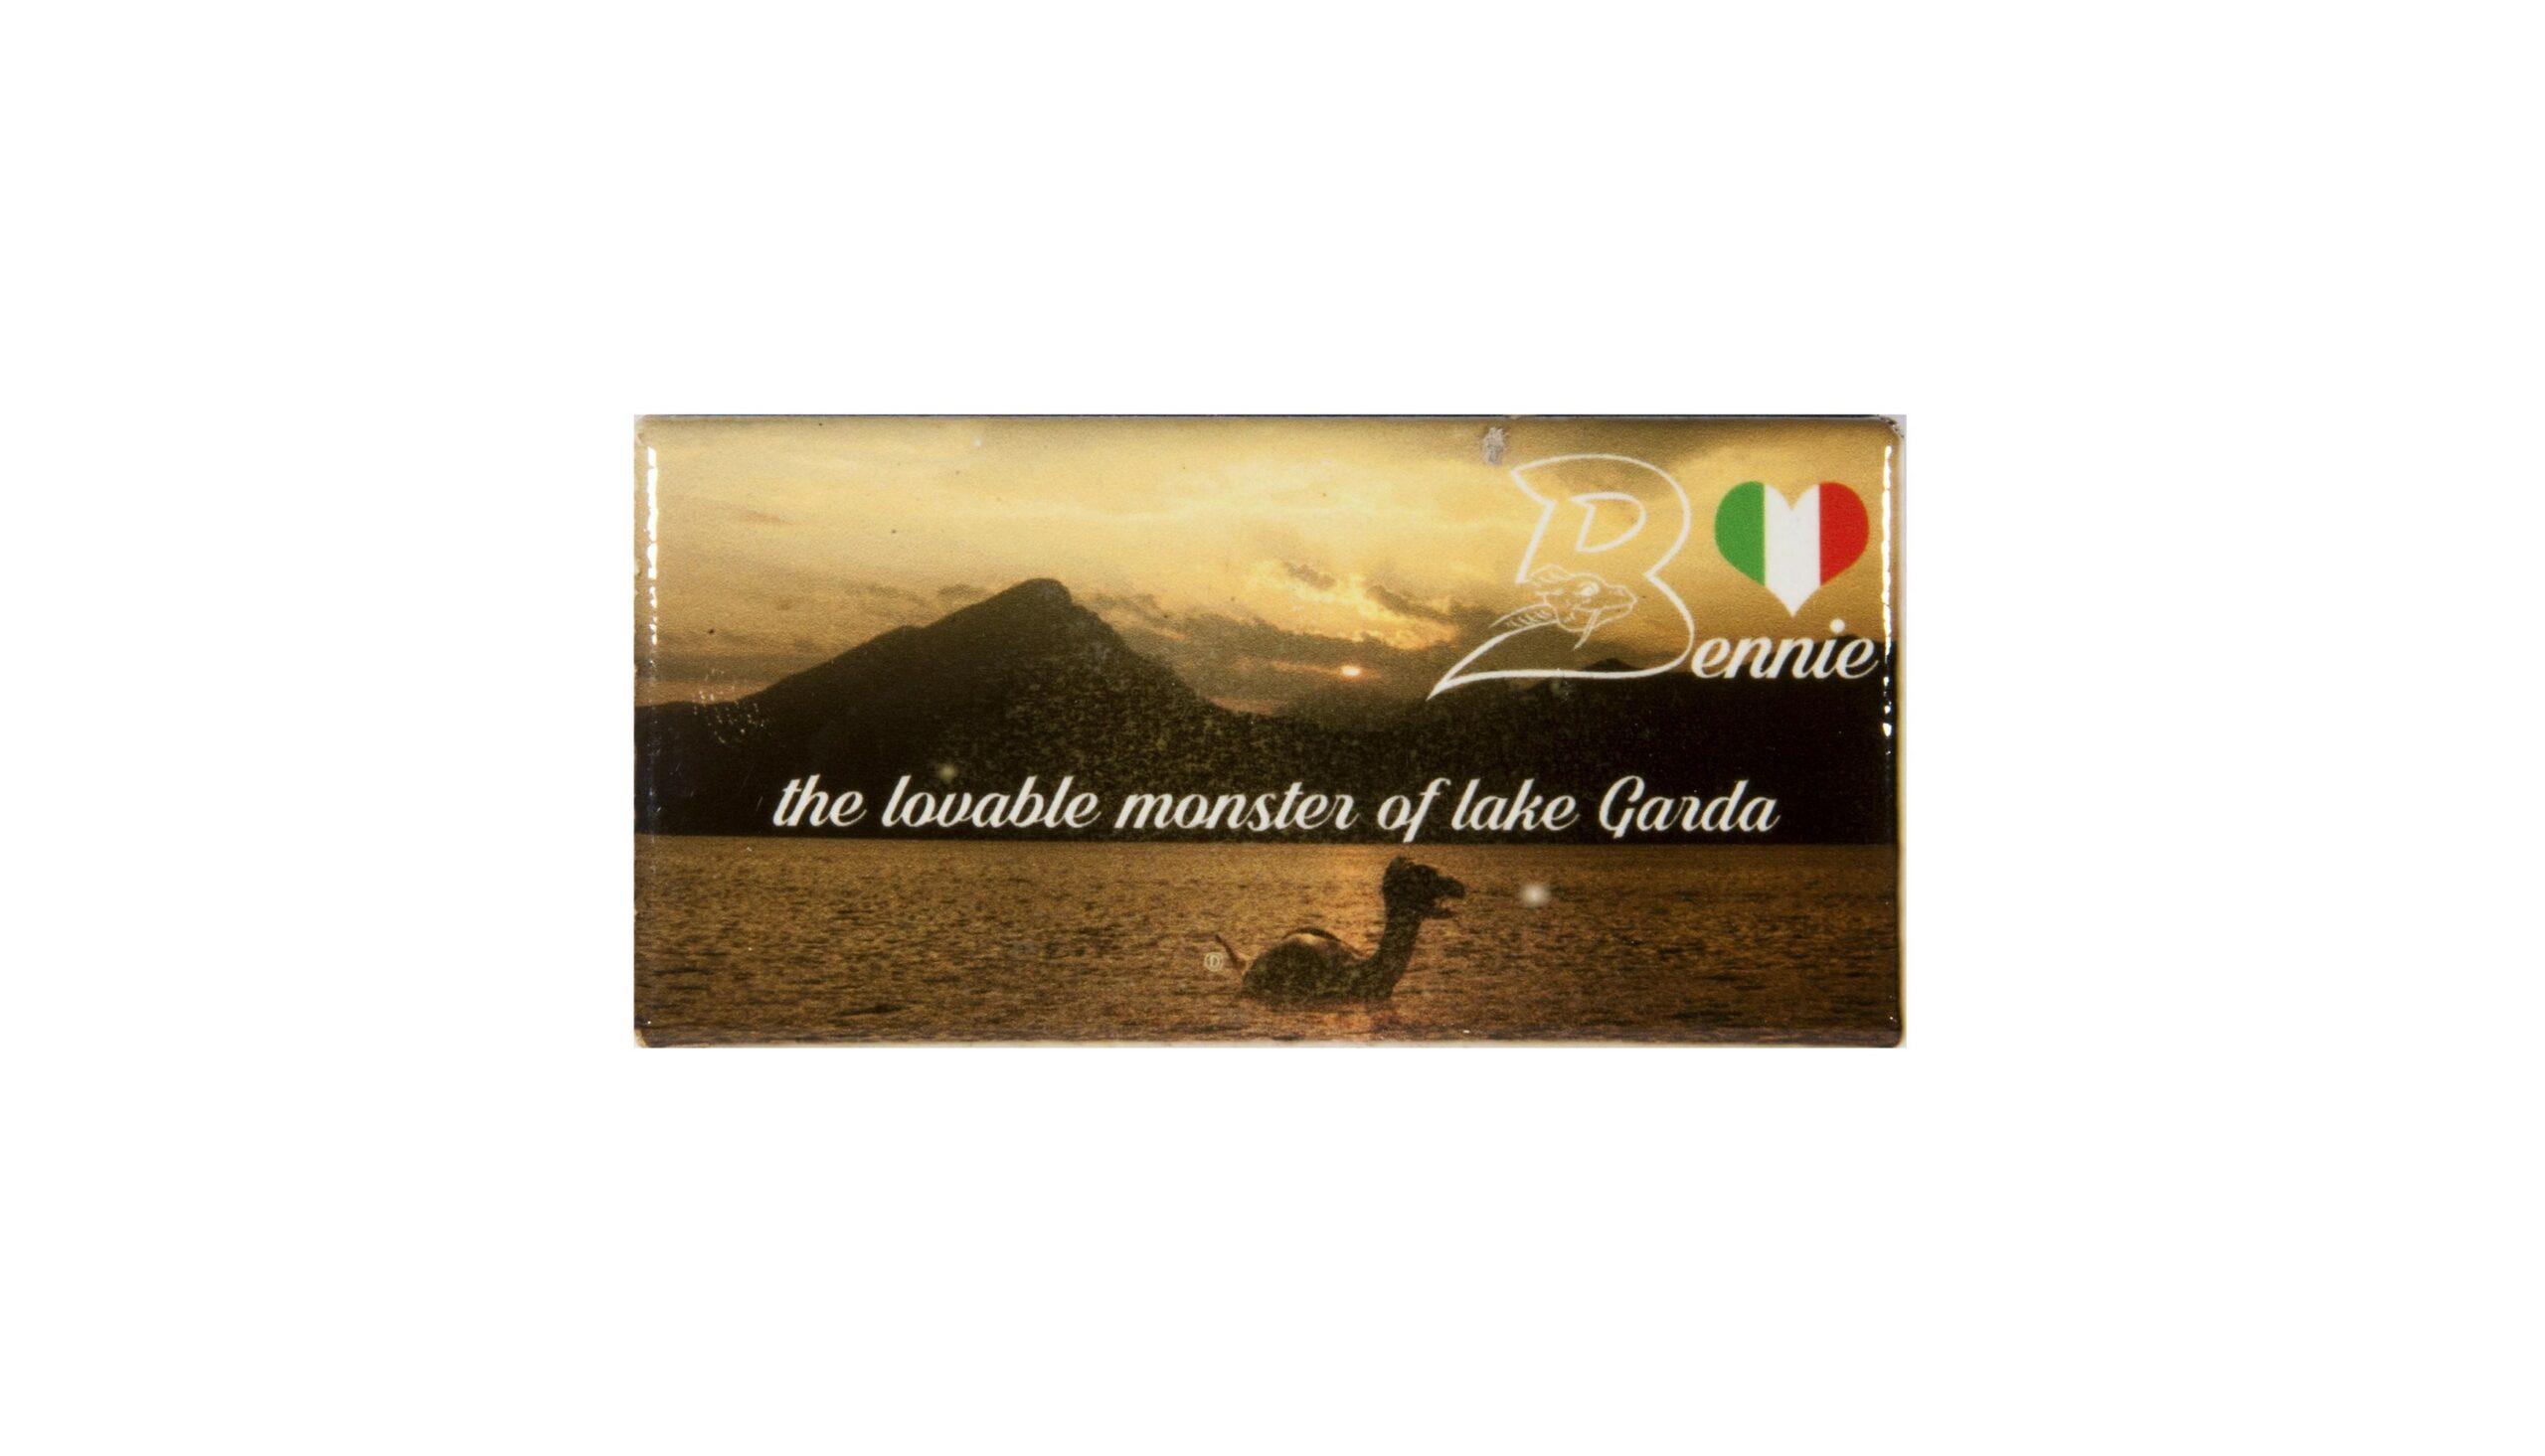 Classic magnet with sundown and Bennie the monster of lake Garda Bthemonster.com